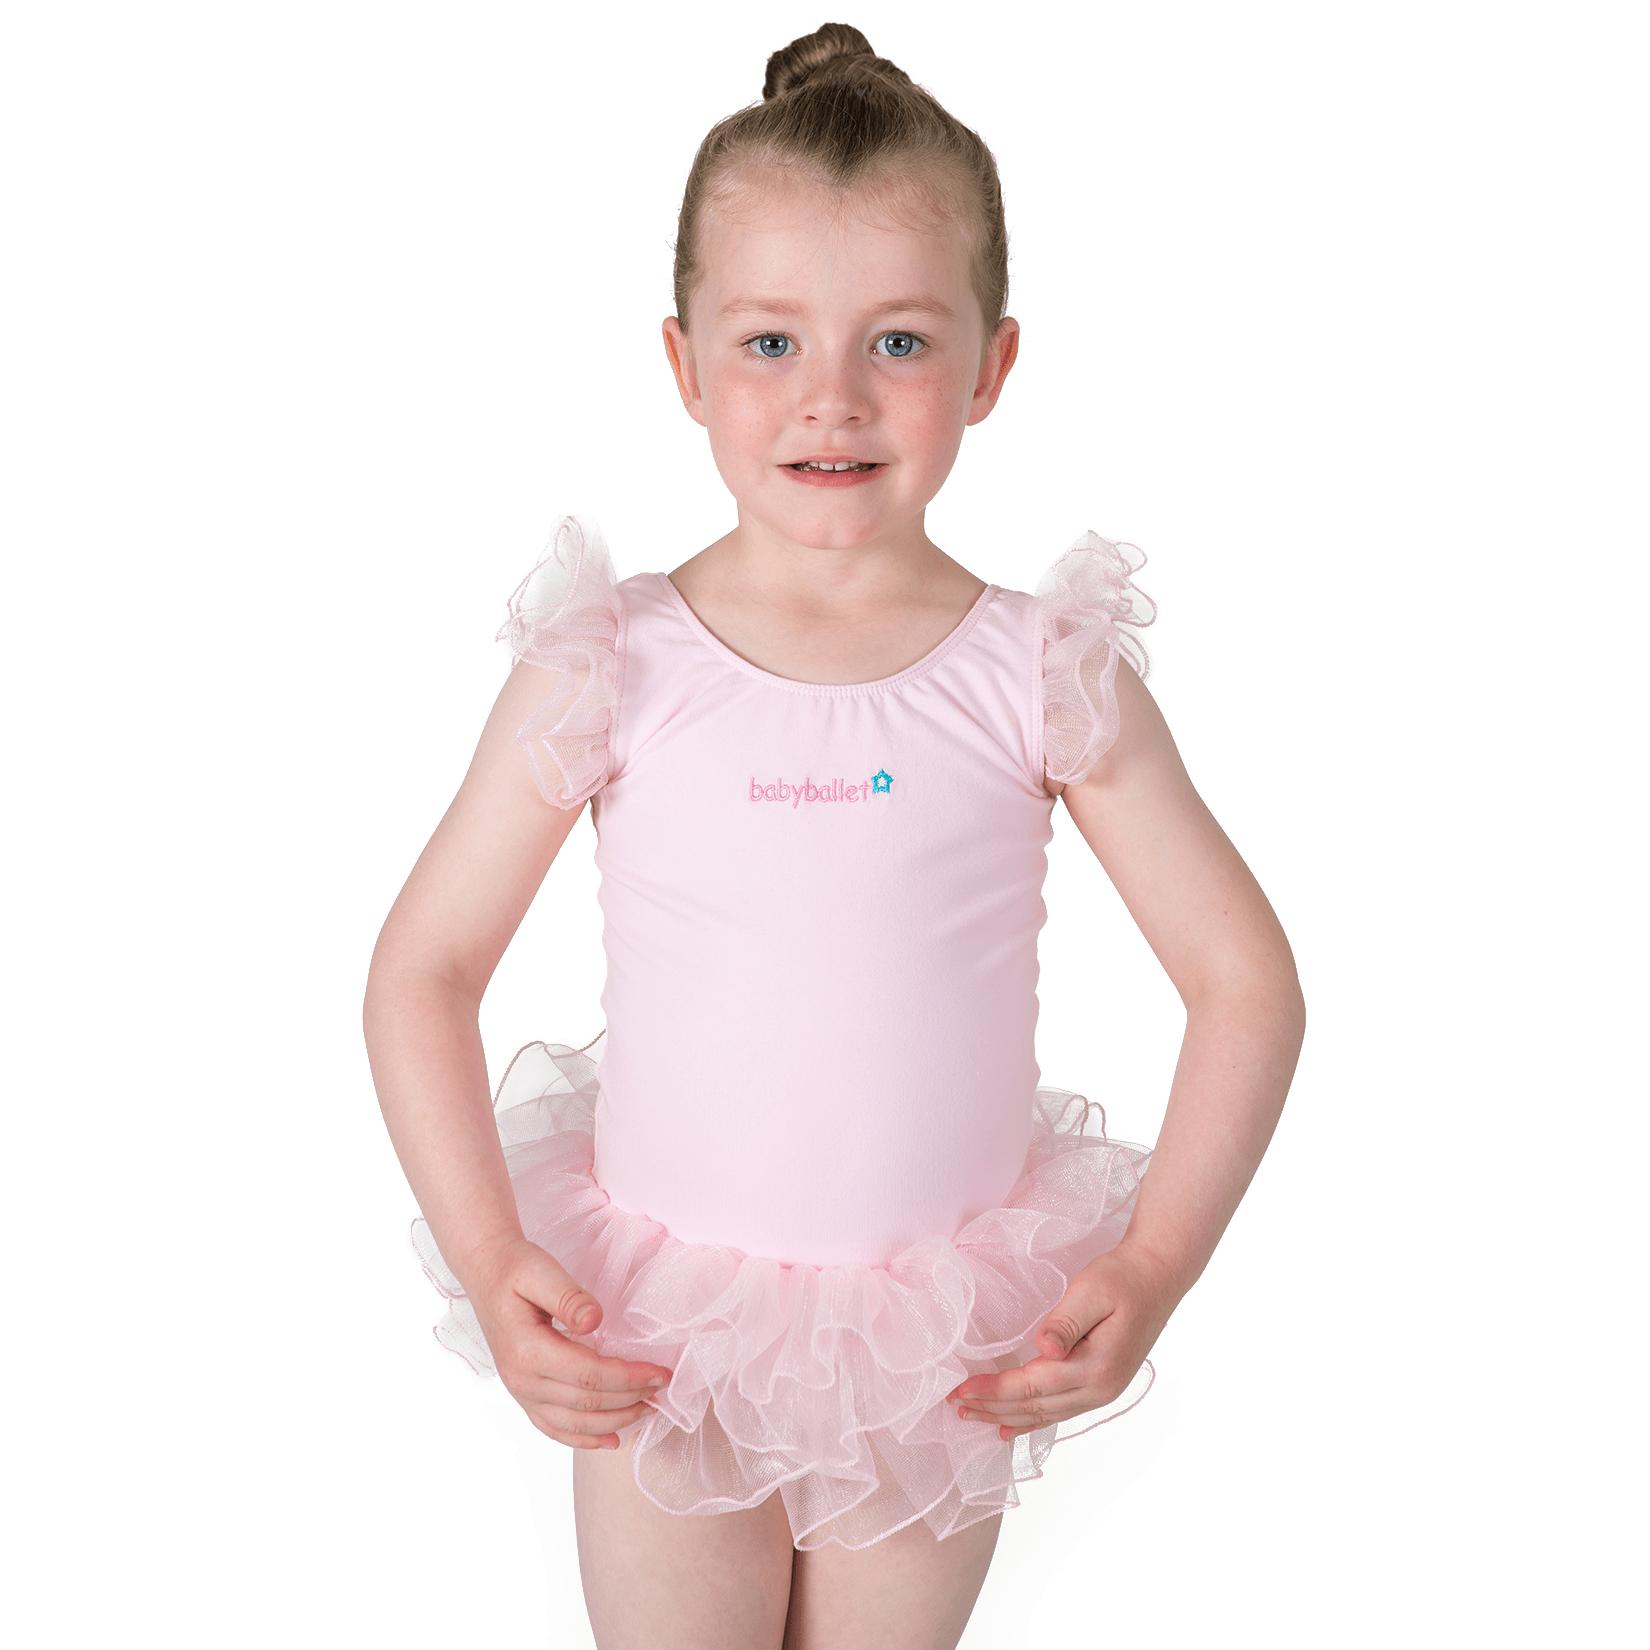 3f61057423 baby ballet twinkle tutu entry level tutu my first tutu (3) · baby ...